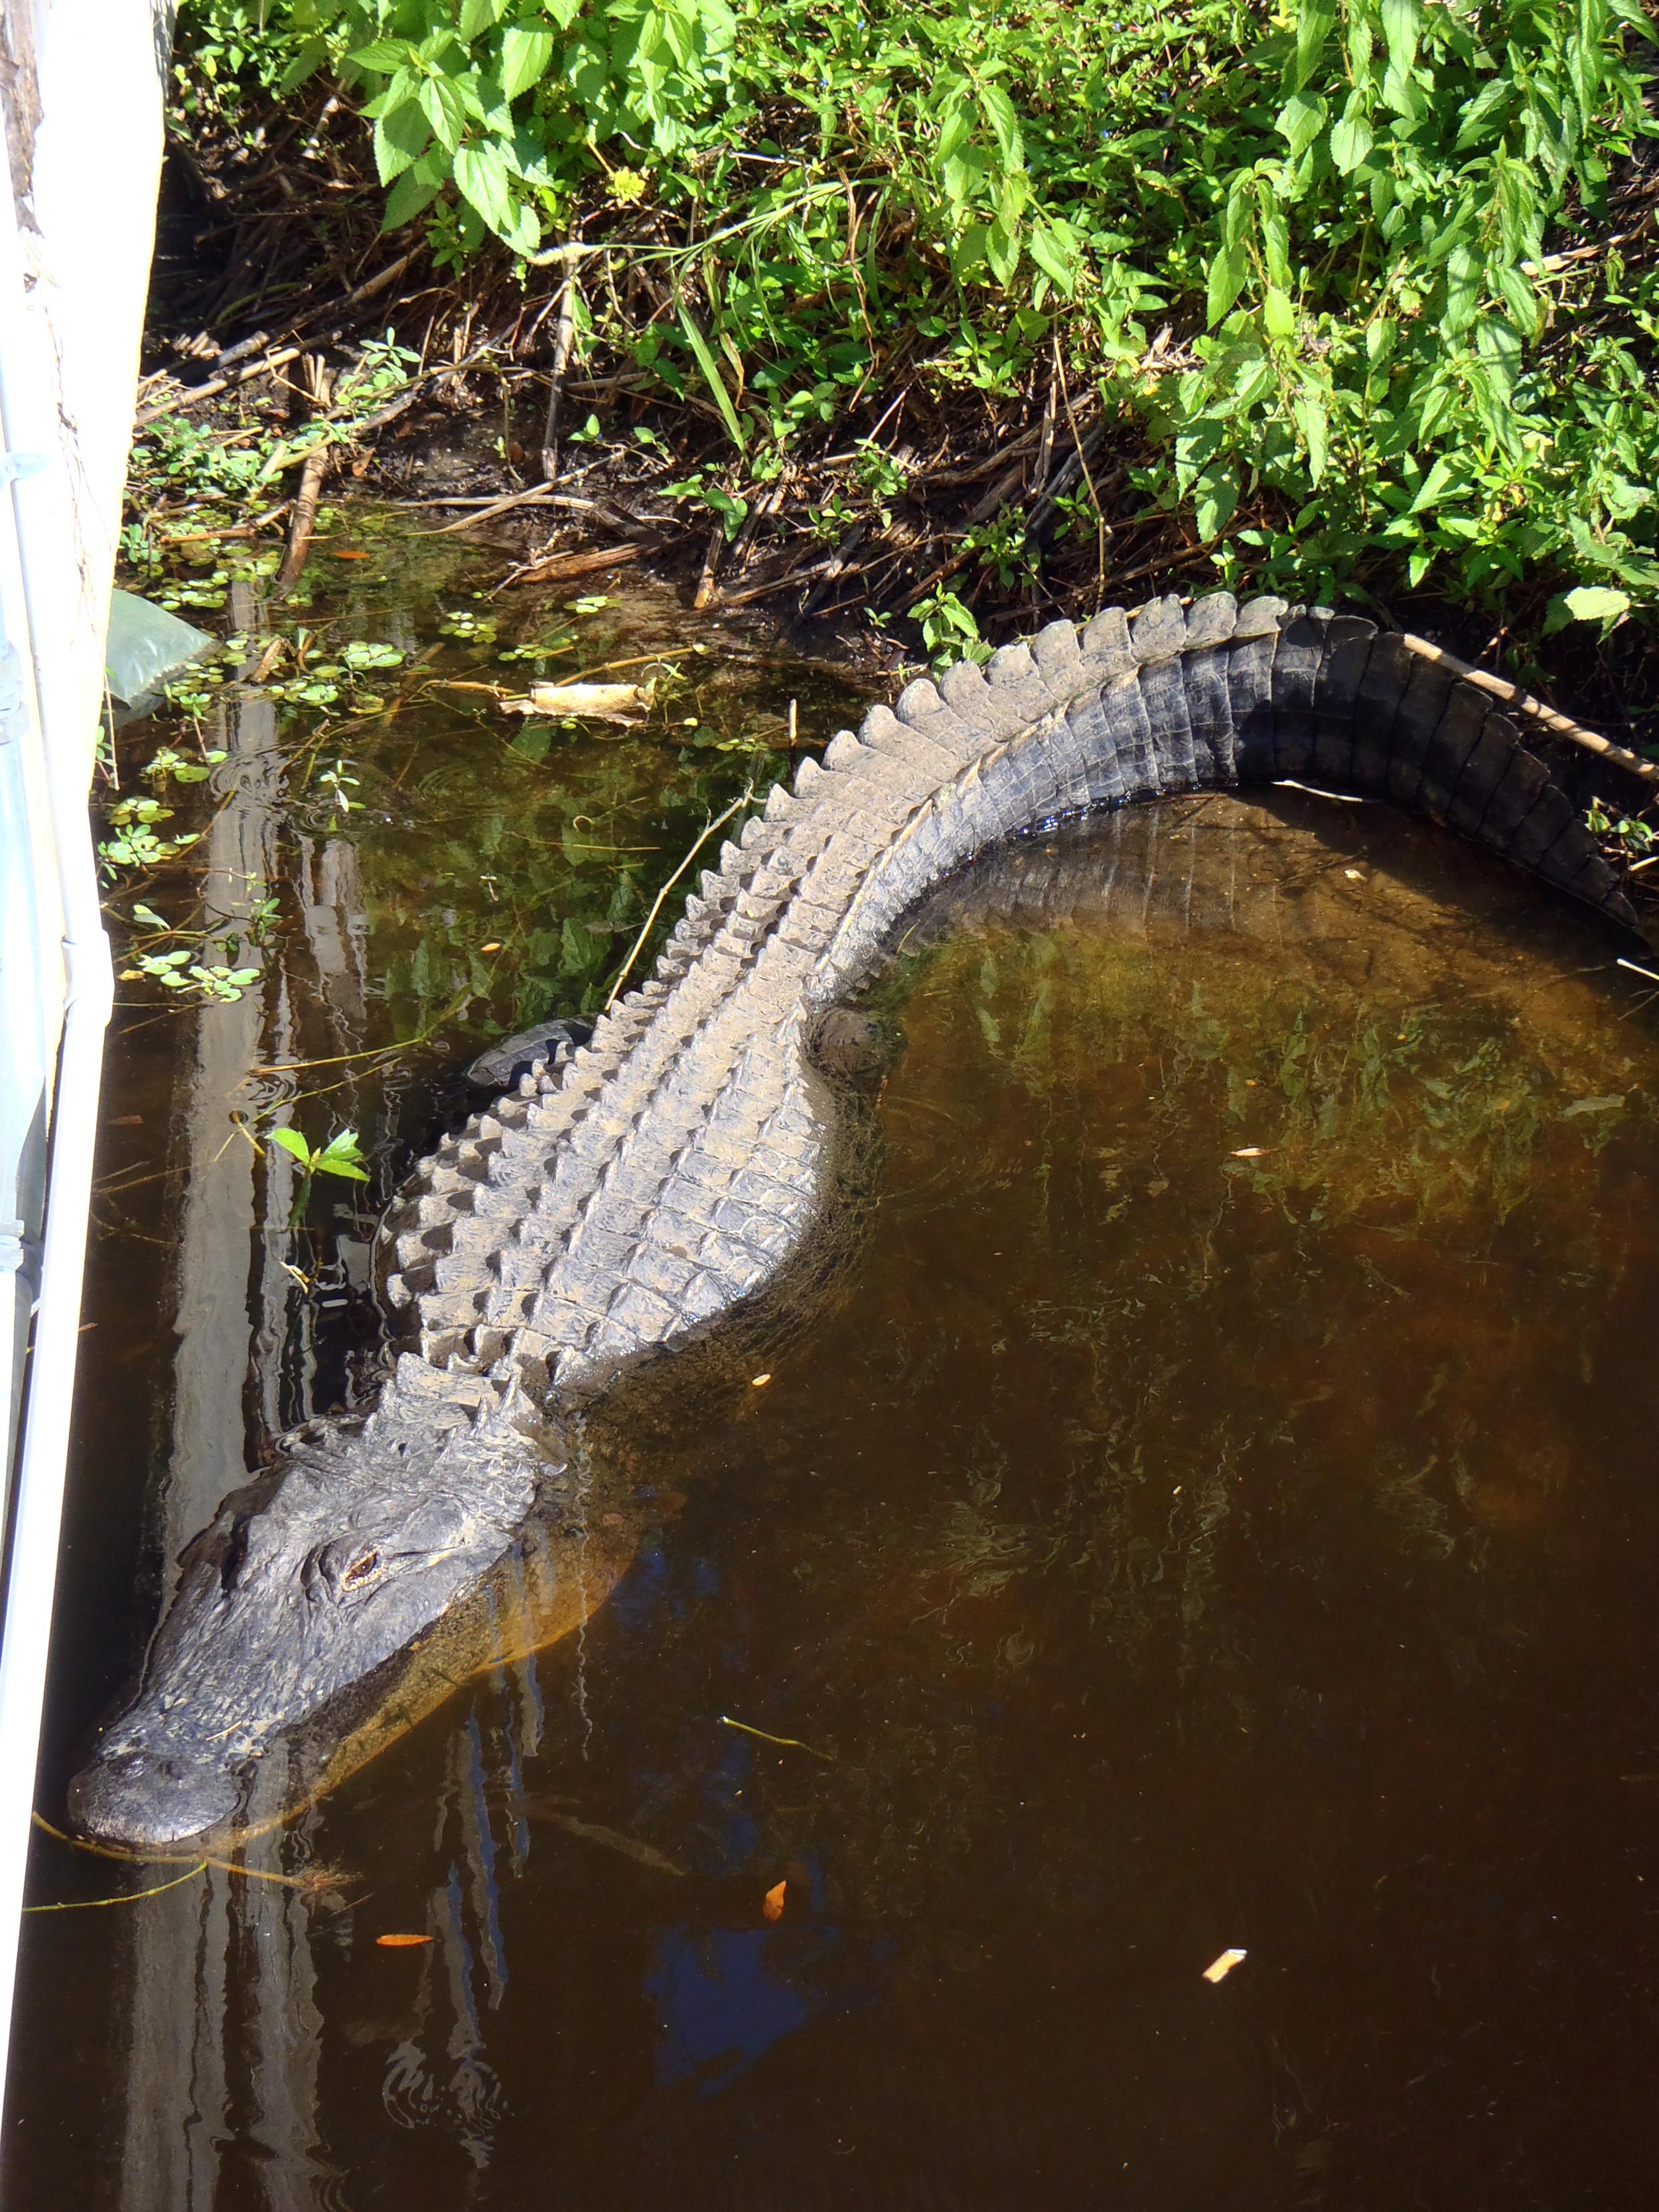 26 Alligator in Inidantown P1010021.png